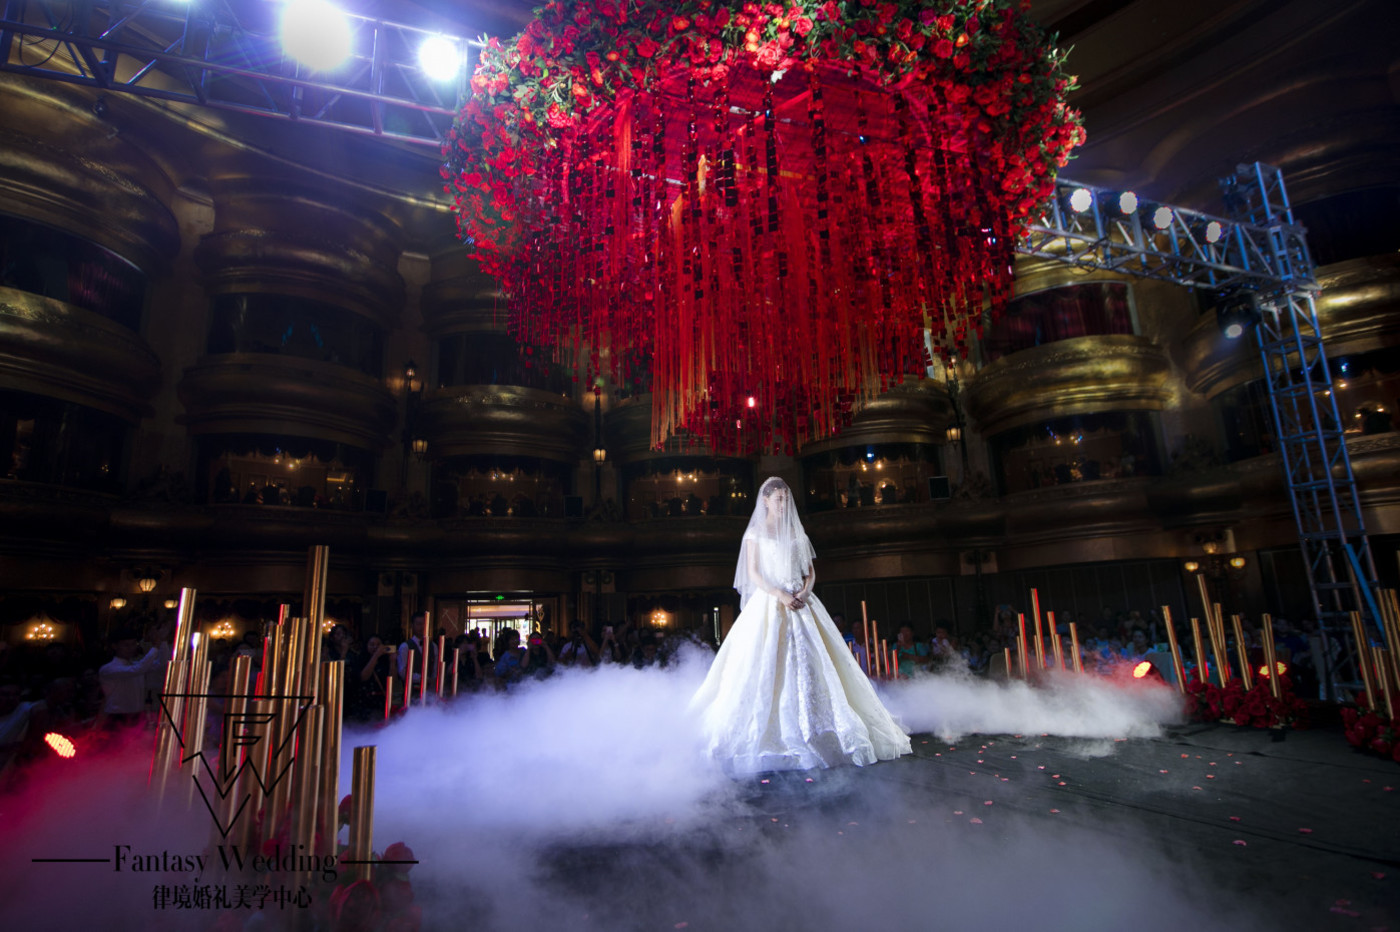 「Fantasy Wedding」& 等你下课4